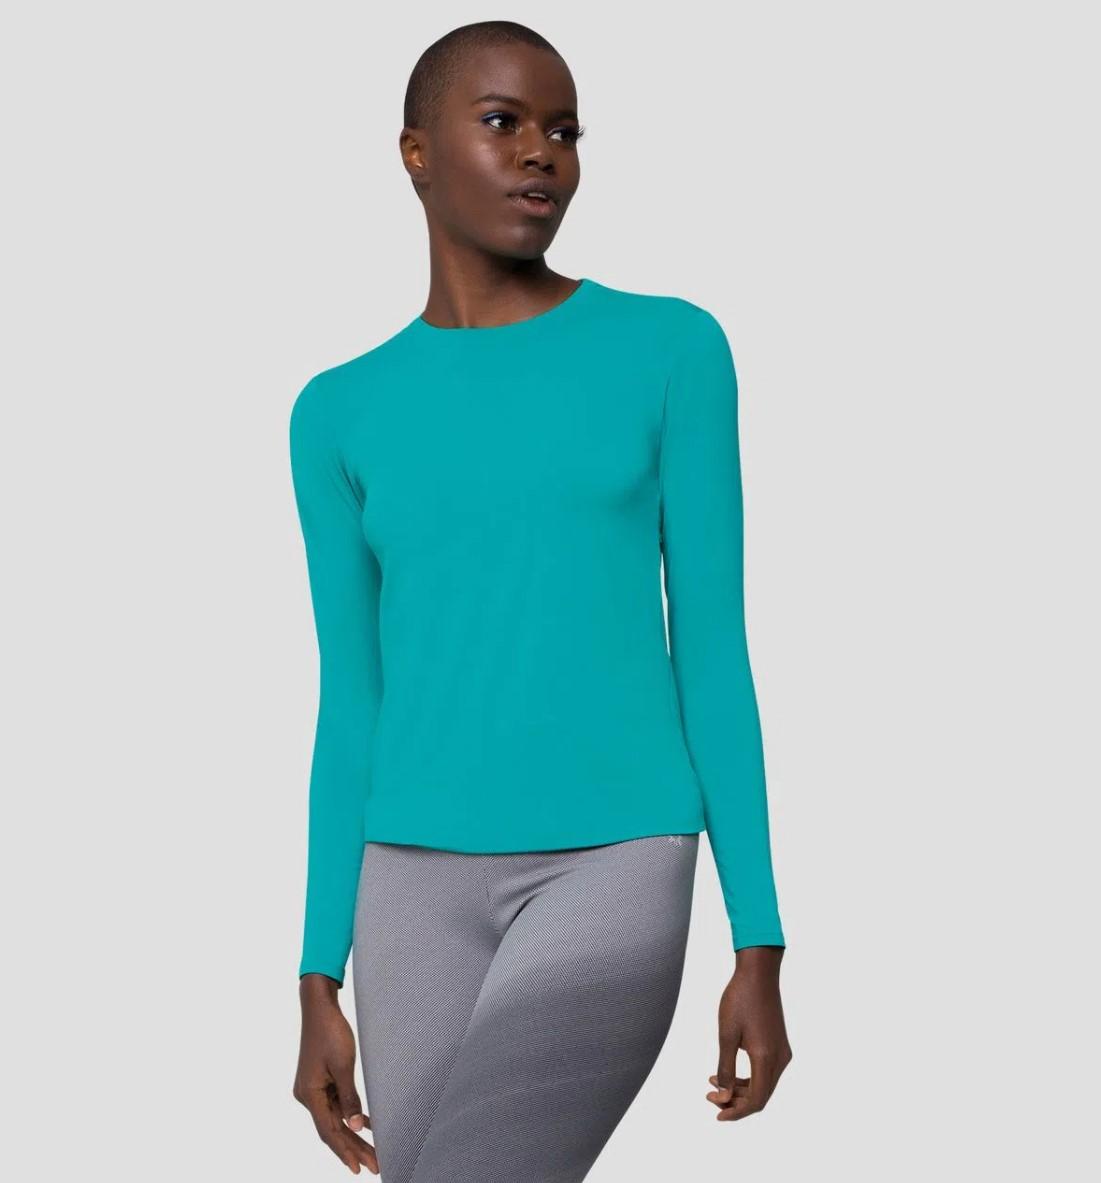 UV LINE Camiseta Uvpro Manga Longa Feminino Verde Mar Proteção Solar